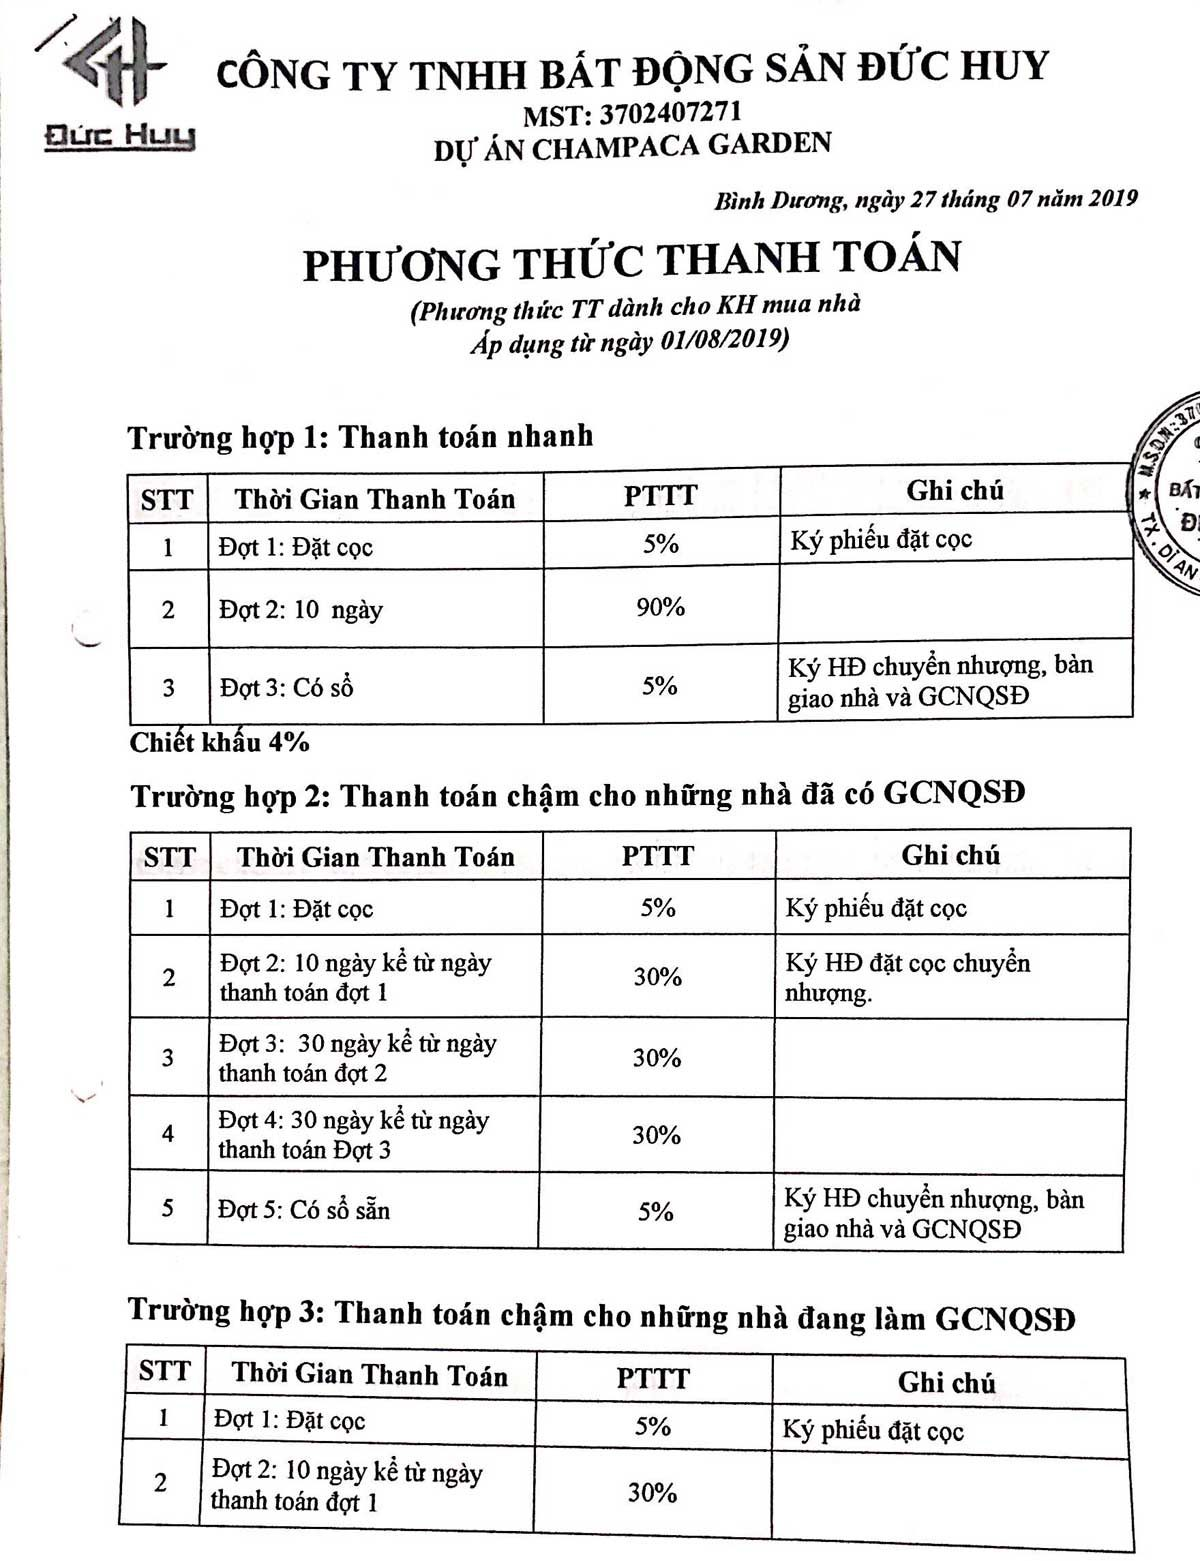 phuong thuc thanh toan du an champaca garden - phuong-thuc-thanh-toan-du-an-champaca-garden